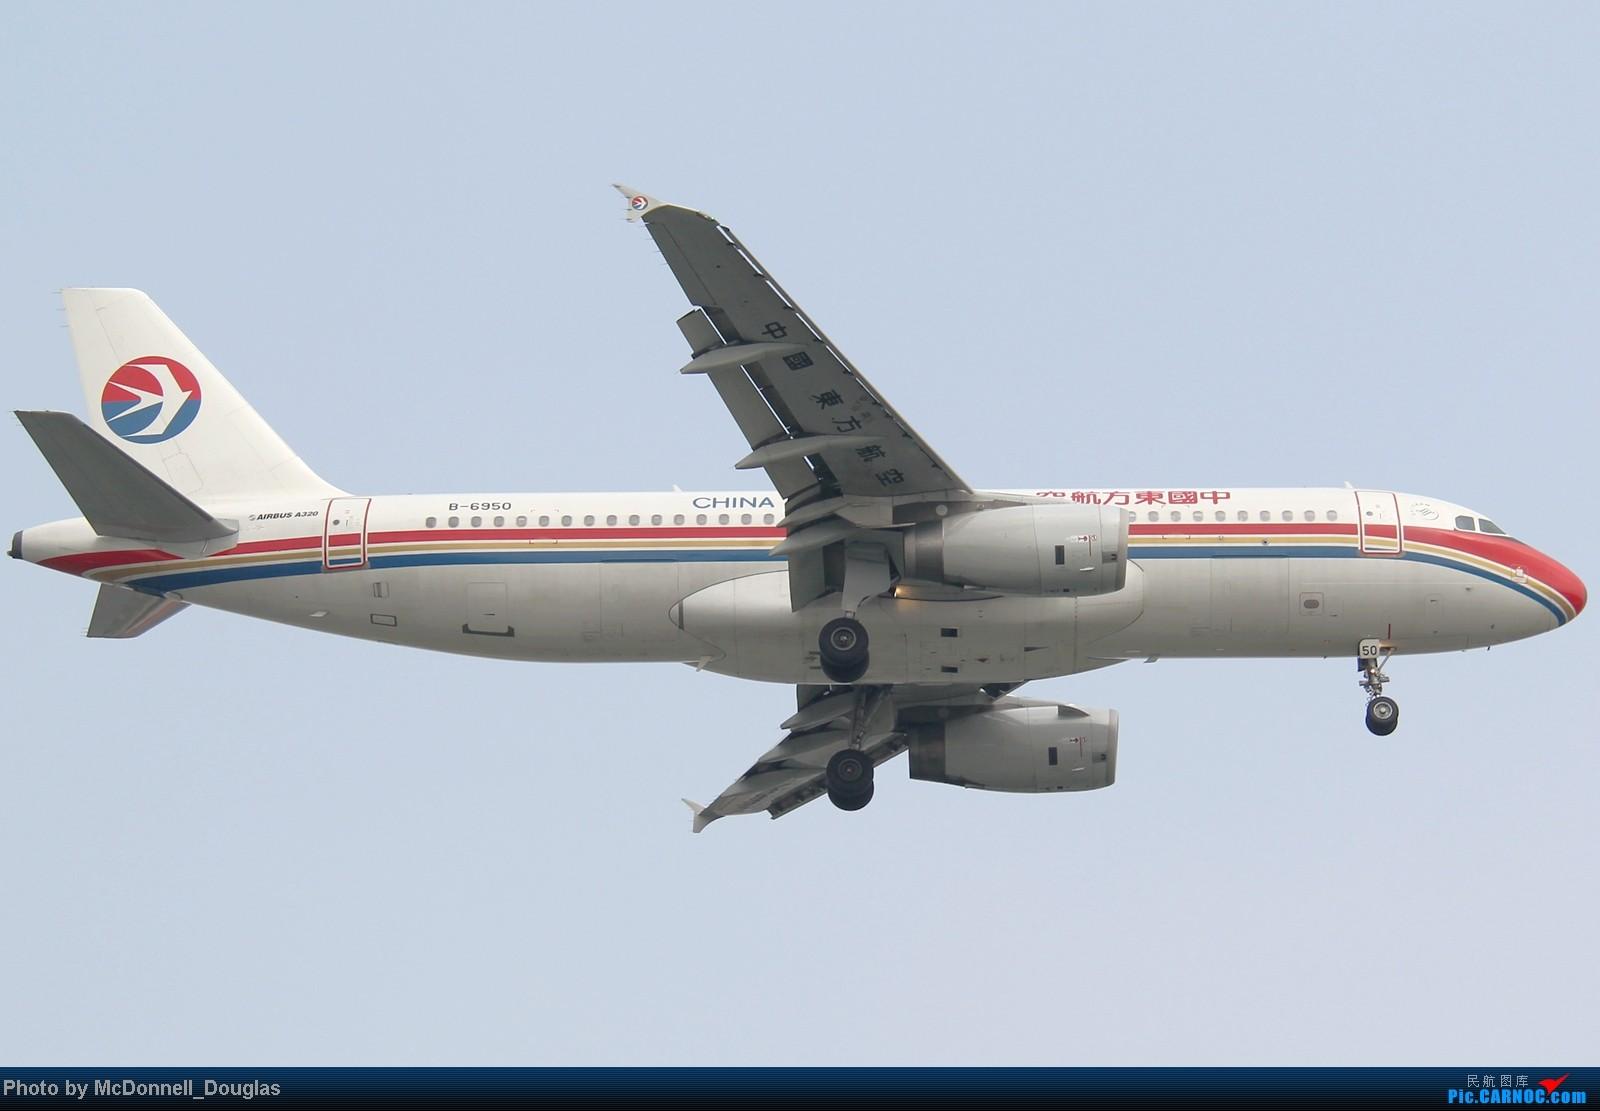 Re:[原创]【上海飞友会】ZSSS杂图一组 AIRBUS A320-200 B-6950 中国上海虹桥机场